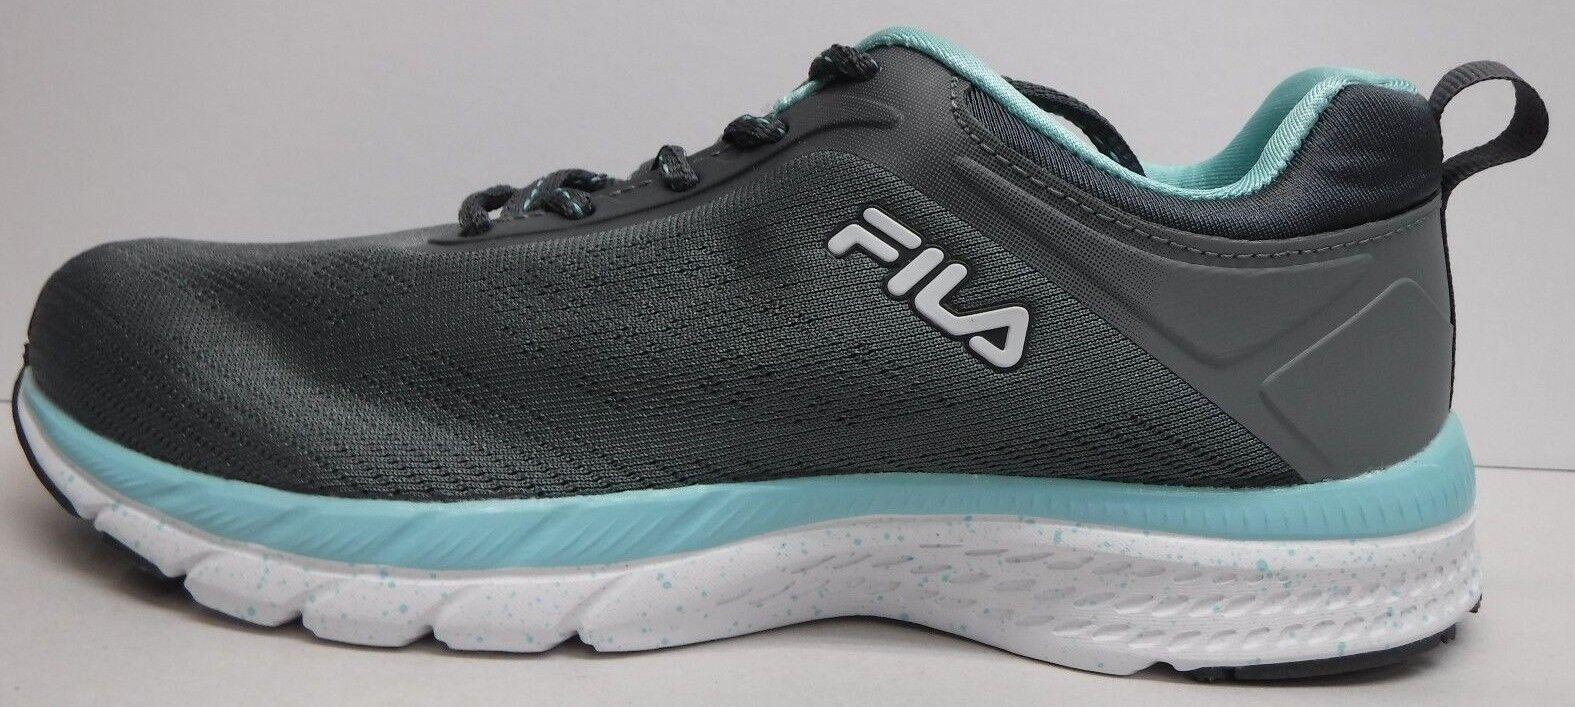 Fila Größe 7 Gray Schuhes Running Sneakers New Damenschuhe Schuhes Gray 134dac